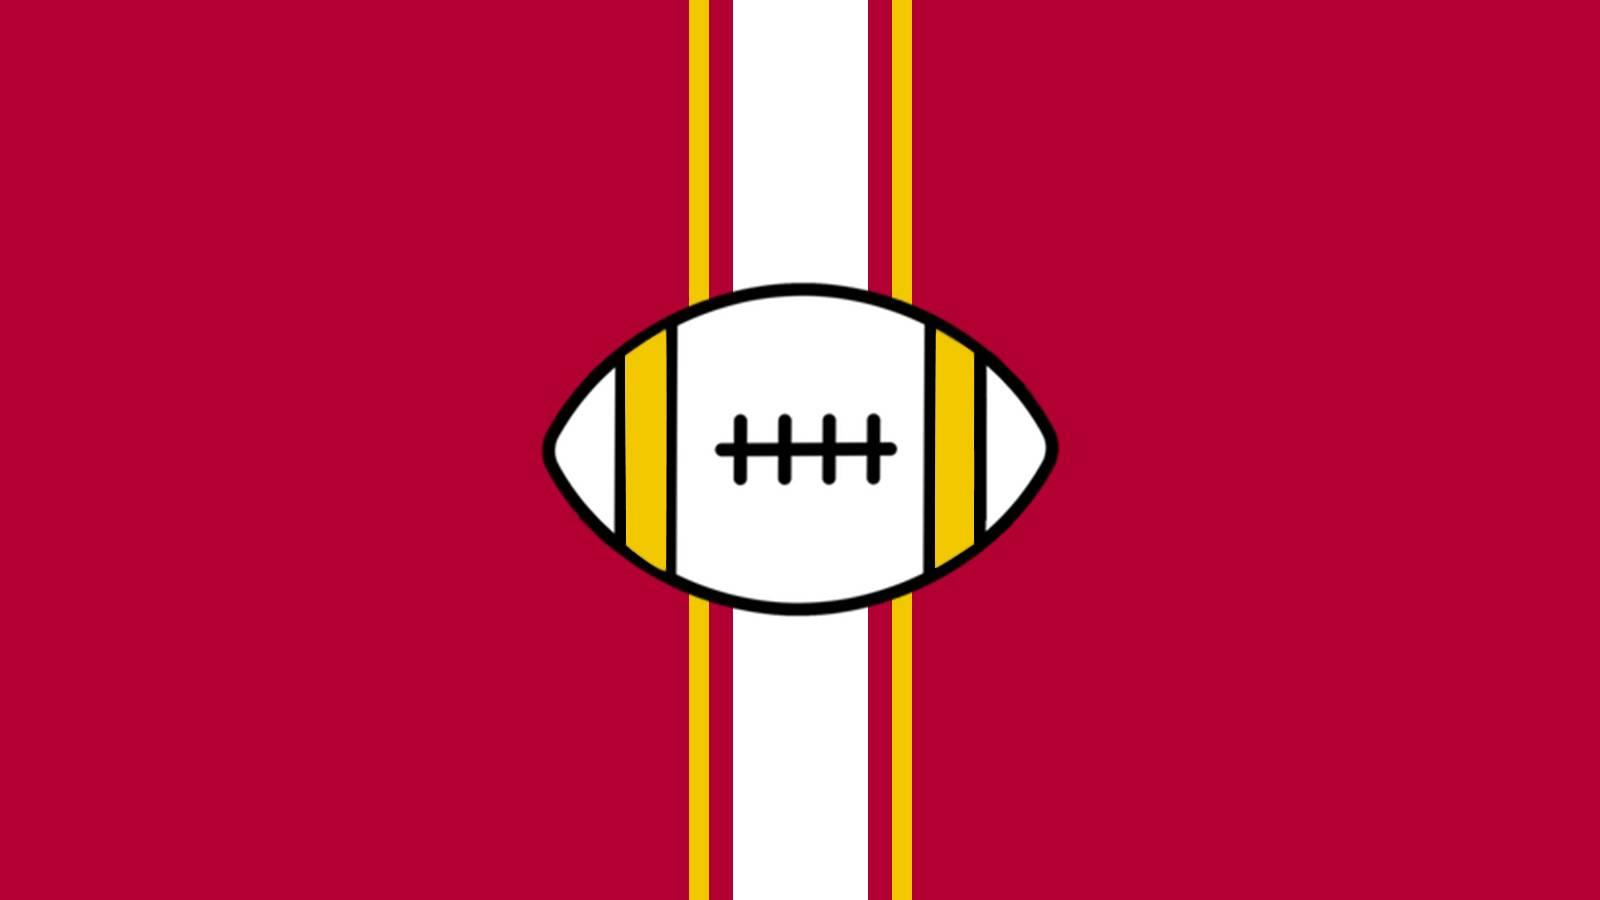 Atlanta Falcons at Kansas City Chiefs